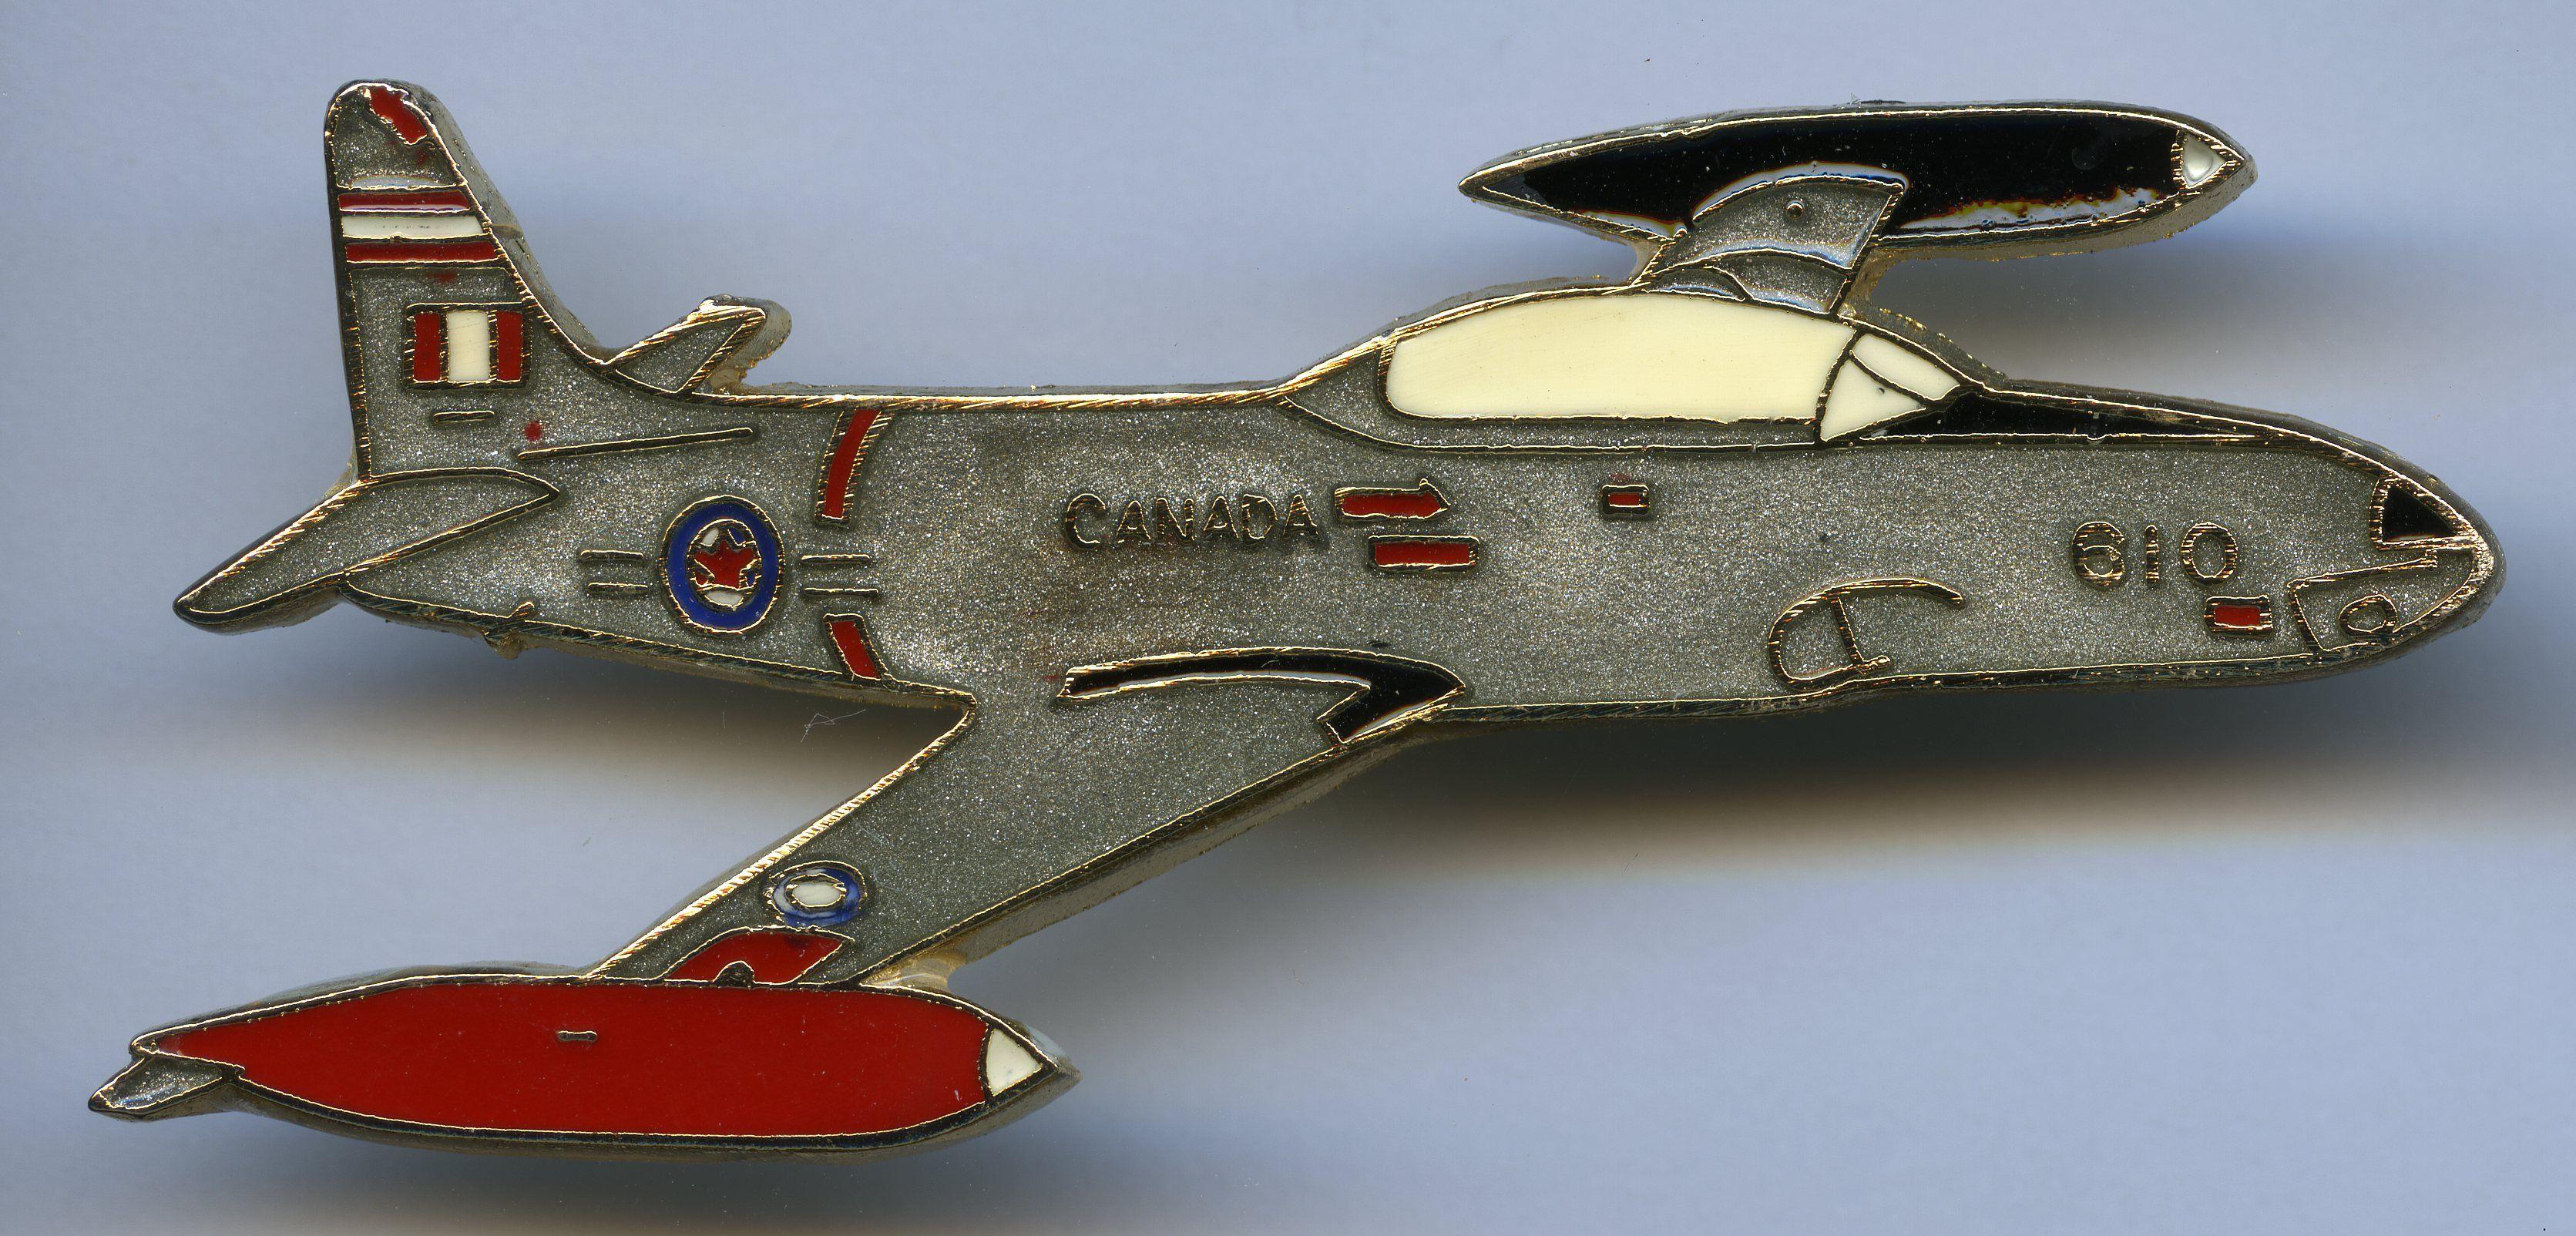 Canadair CT133 Silver Star pin (PKD Medley, Alberta